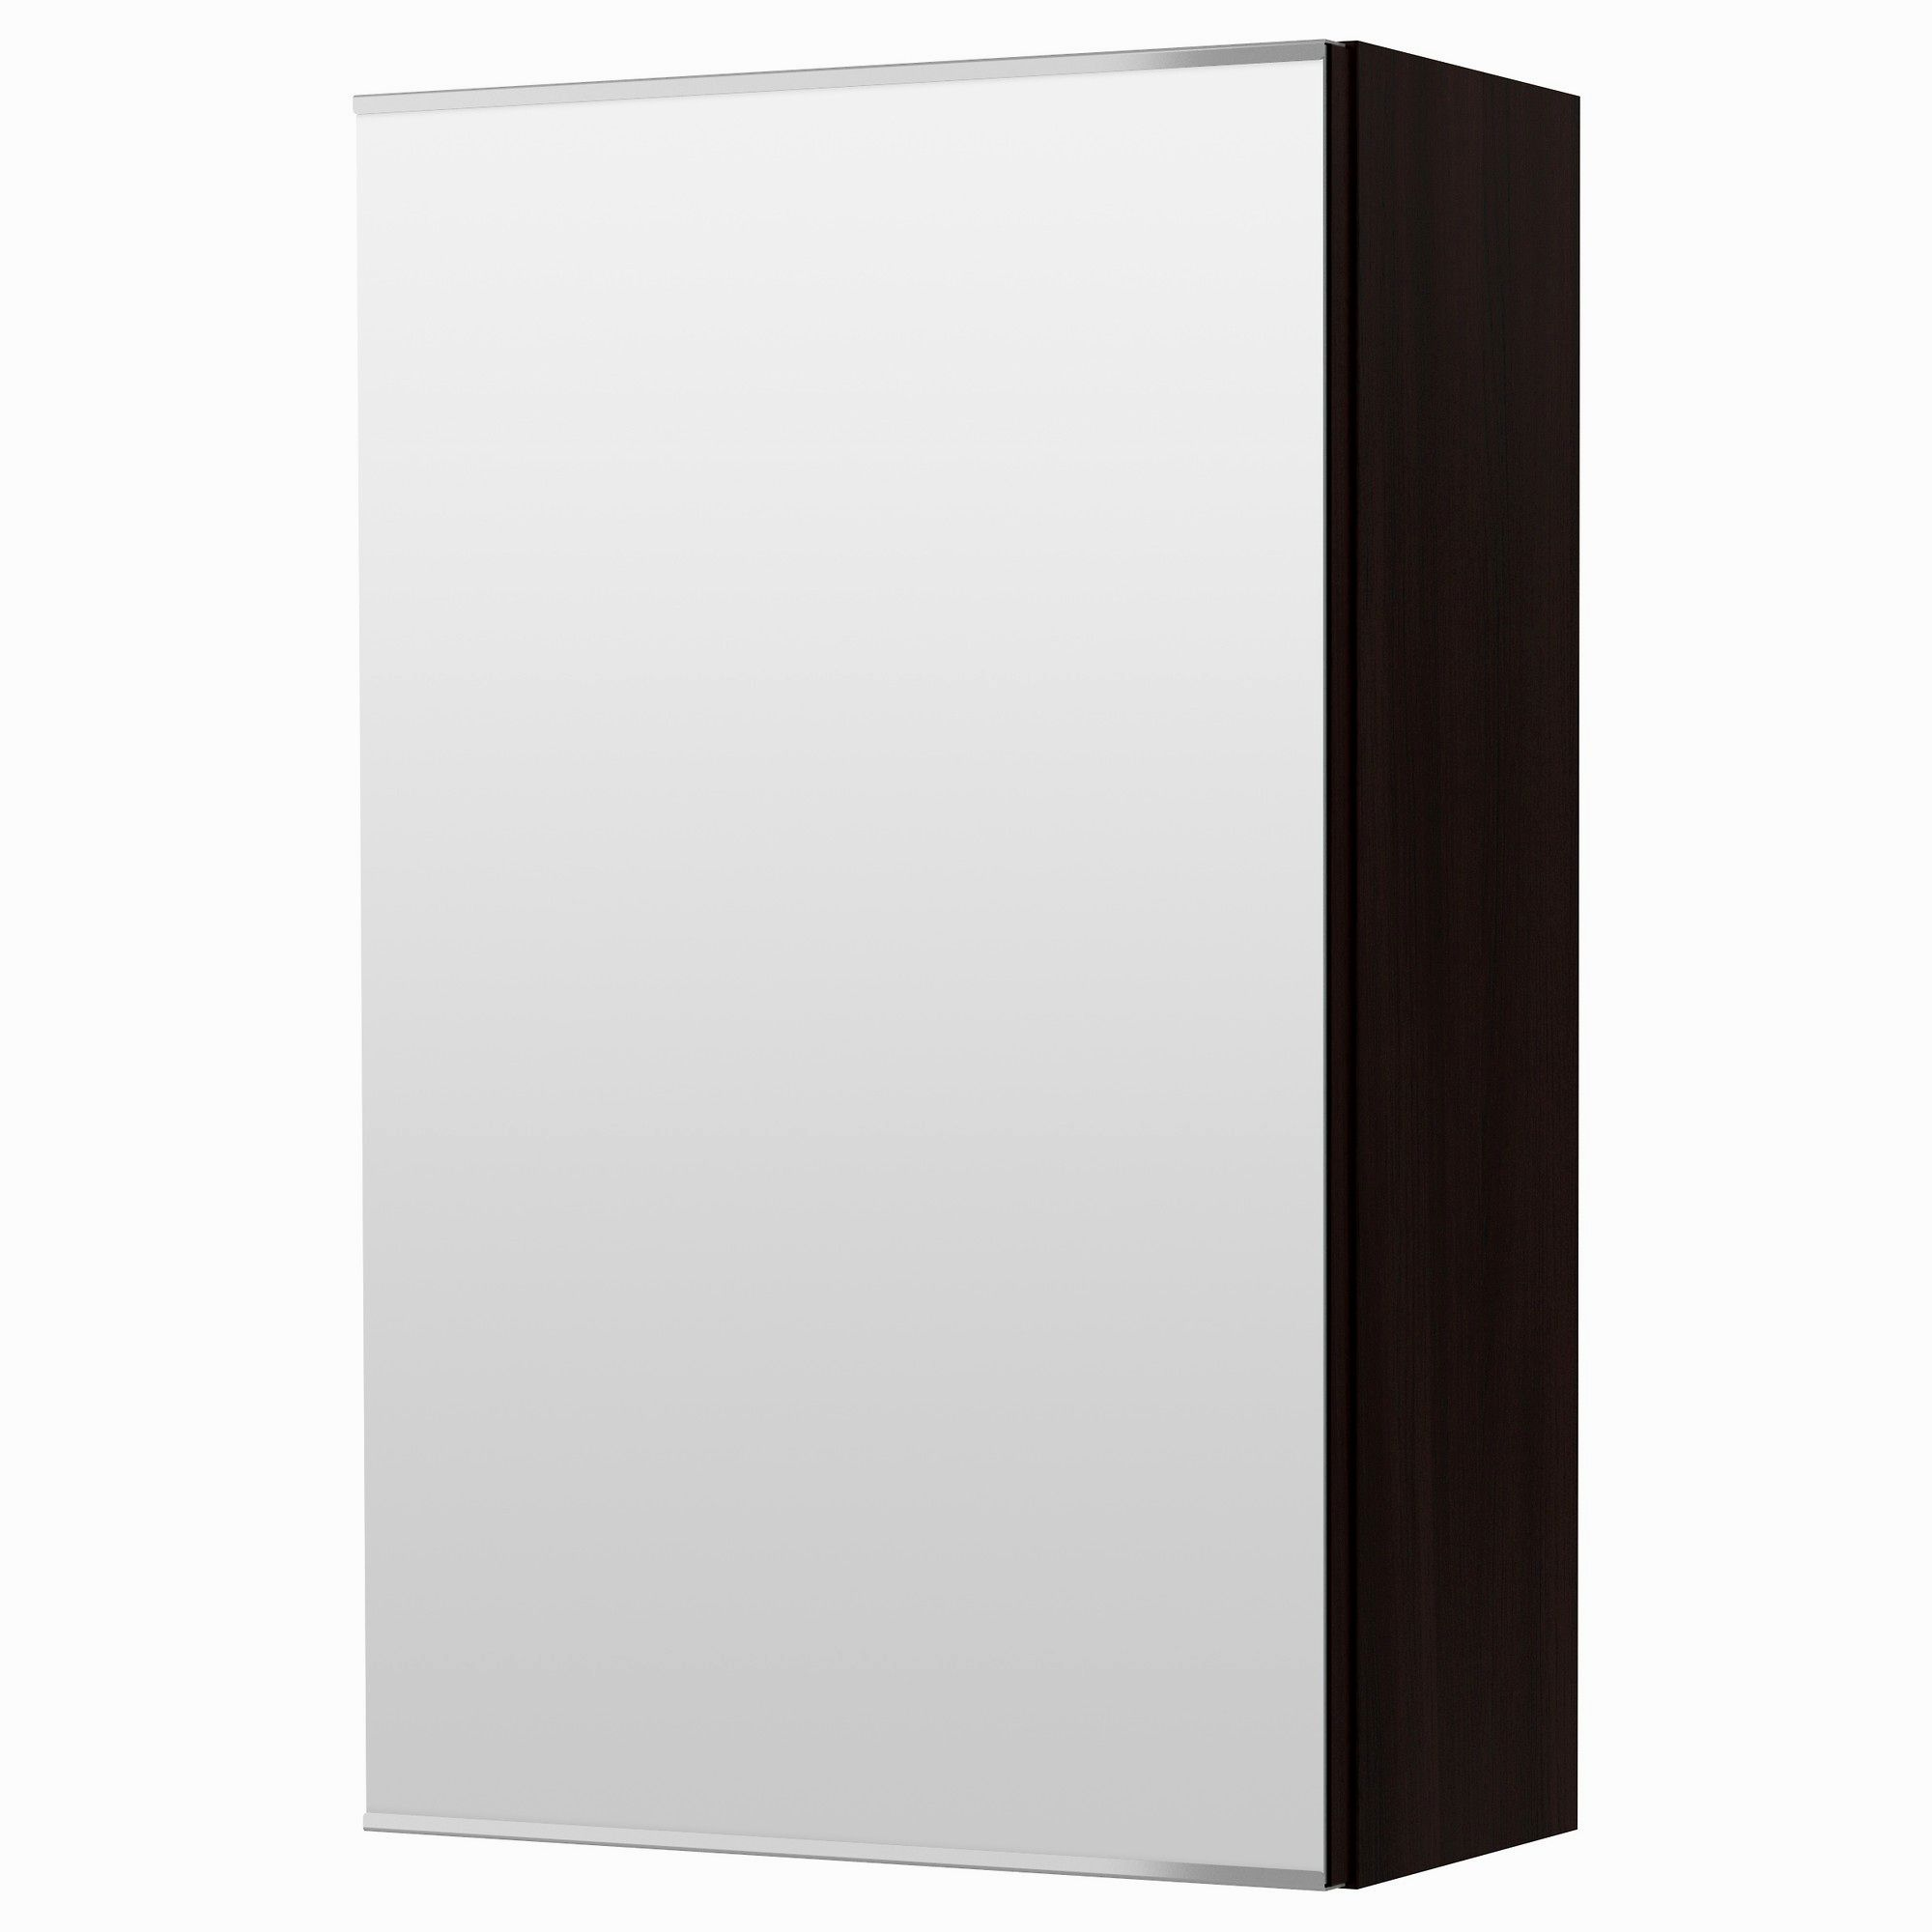 finest bathroom mirror cabinets wallpaper-Fascinating Bathroom Mirror Cabinets Construction